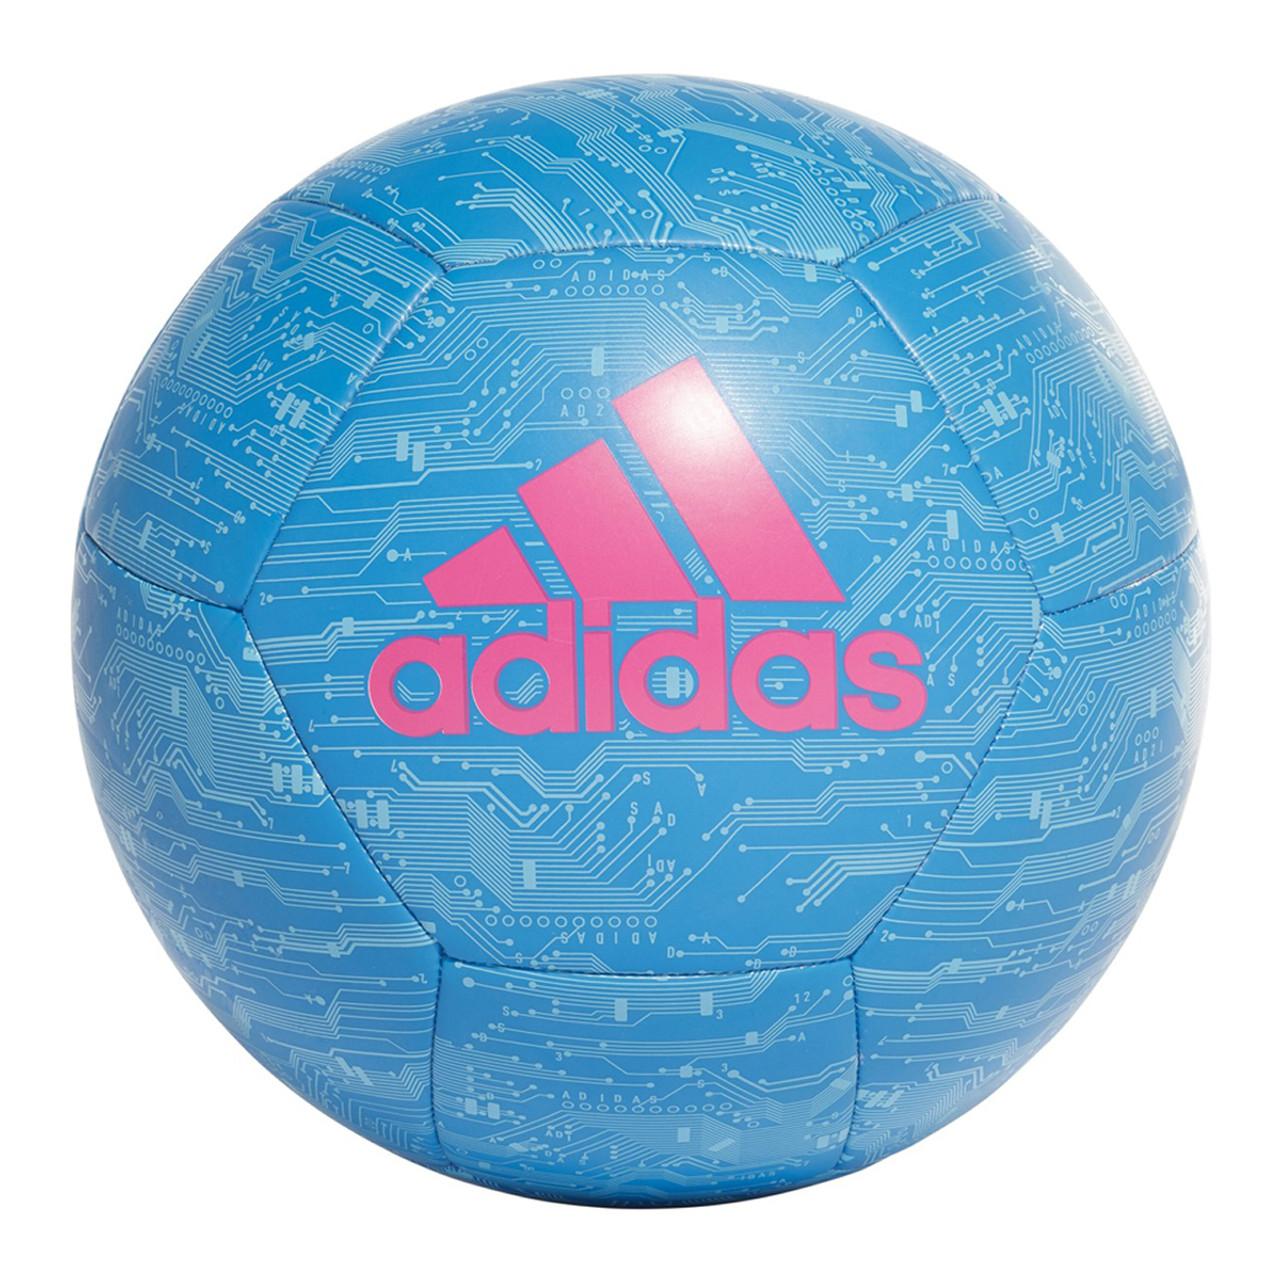 a3b382031 Adidas Capitano Soccer Ball DY2570 - Bright Blue, Cyan, Pink